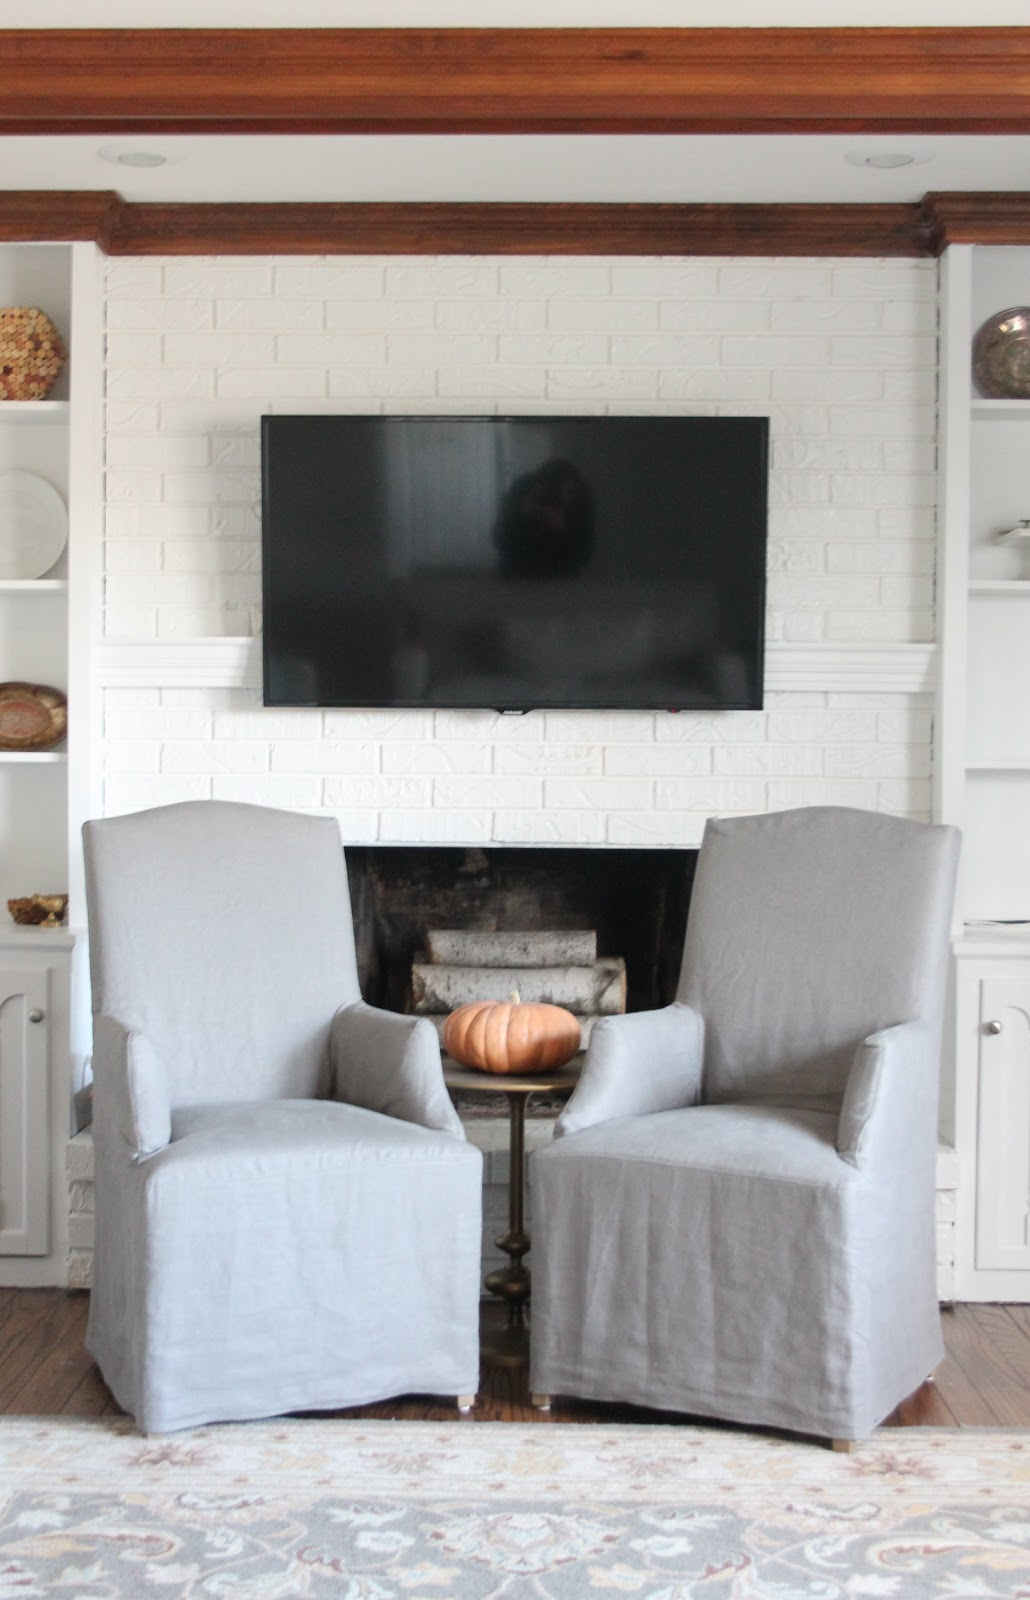 hiding cord on wall mount for flat screen tv diy mantel julie blanner. Black Bedroom Furniture Sets. Home Design Ideas